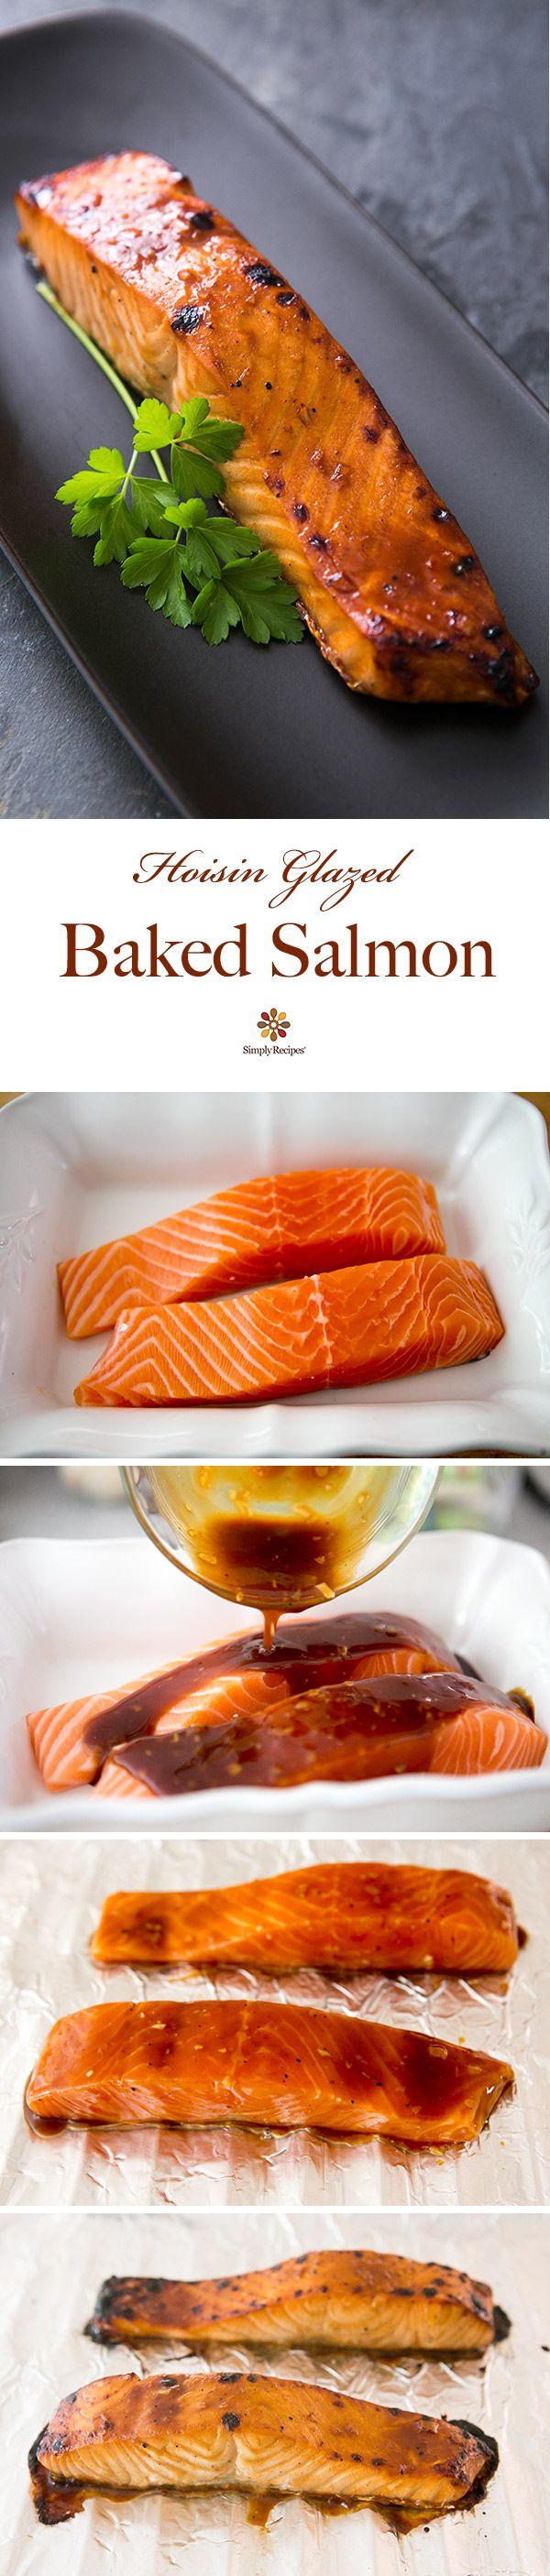 Hoisin Glazed Baked Salmon ~ Quick and easy broiled salmon fillets with a hoisin sauce glaze. ~ SimplyRecipes.com